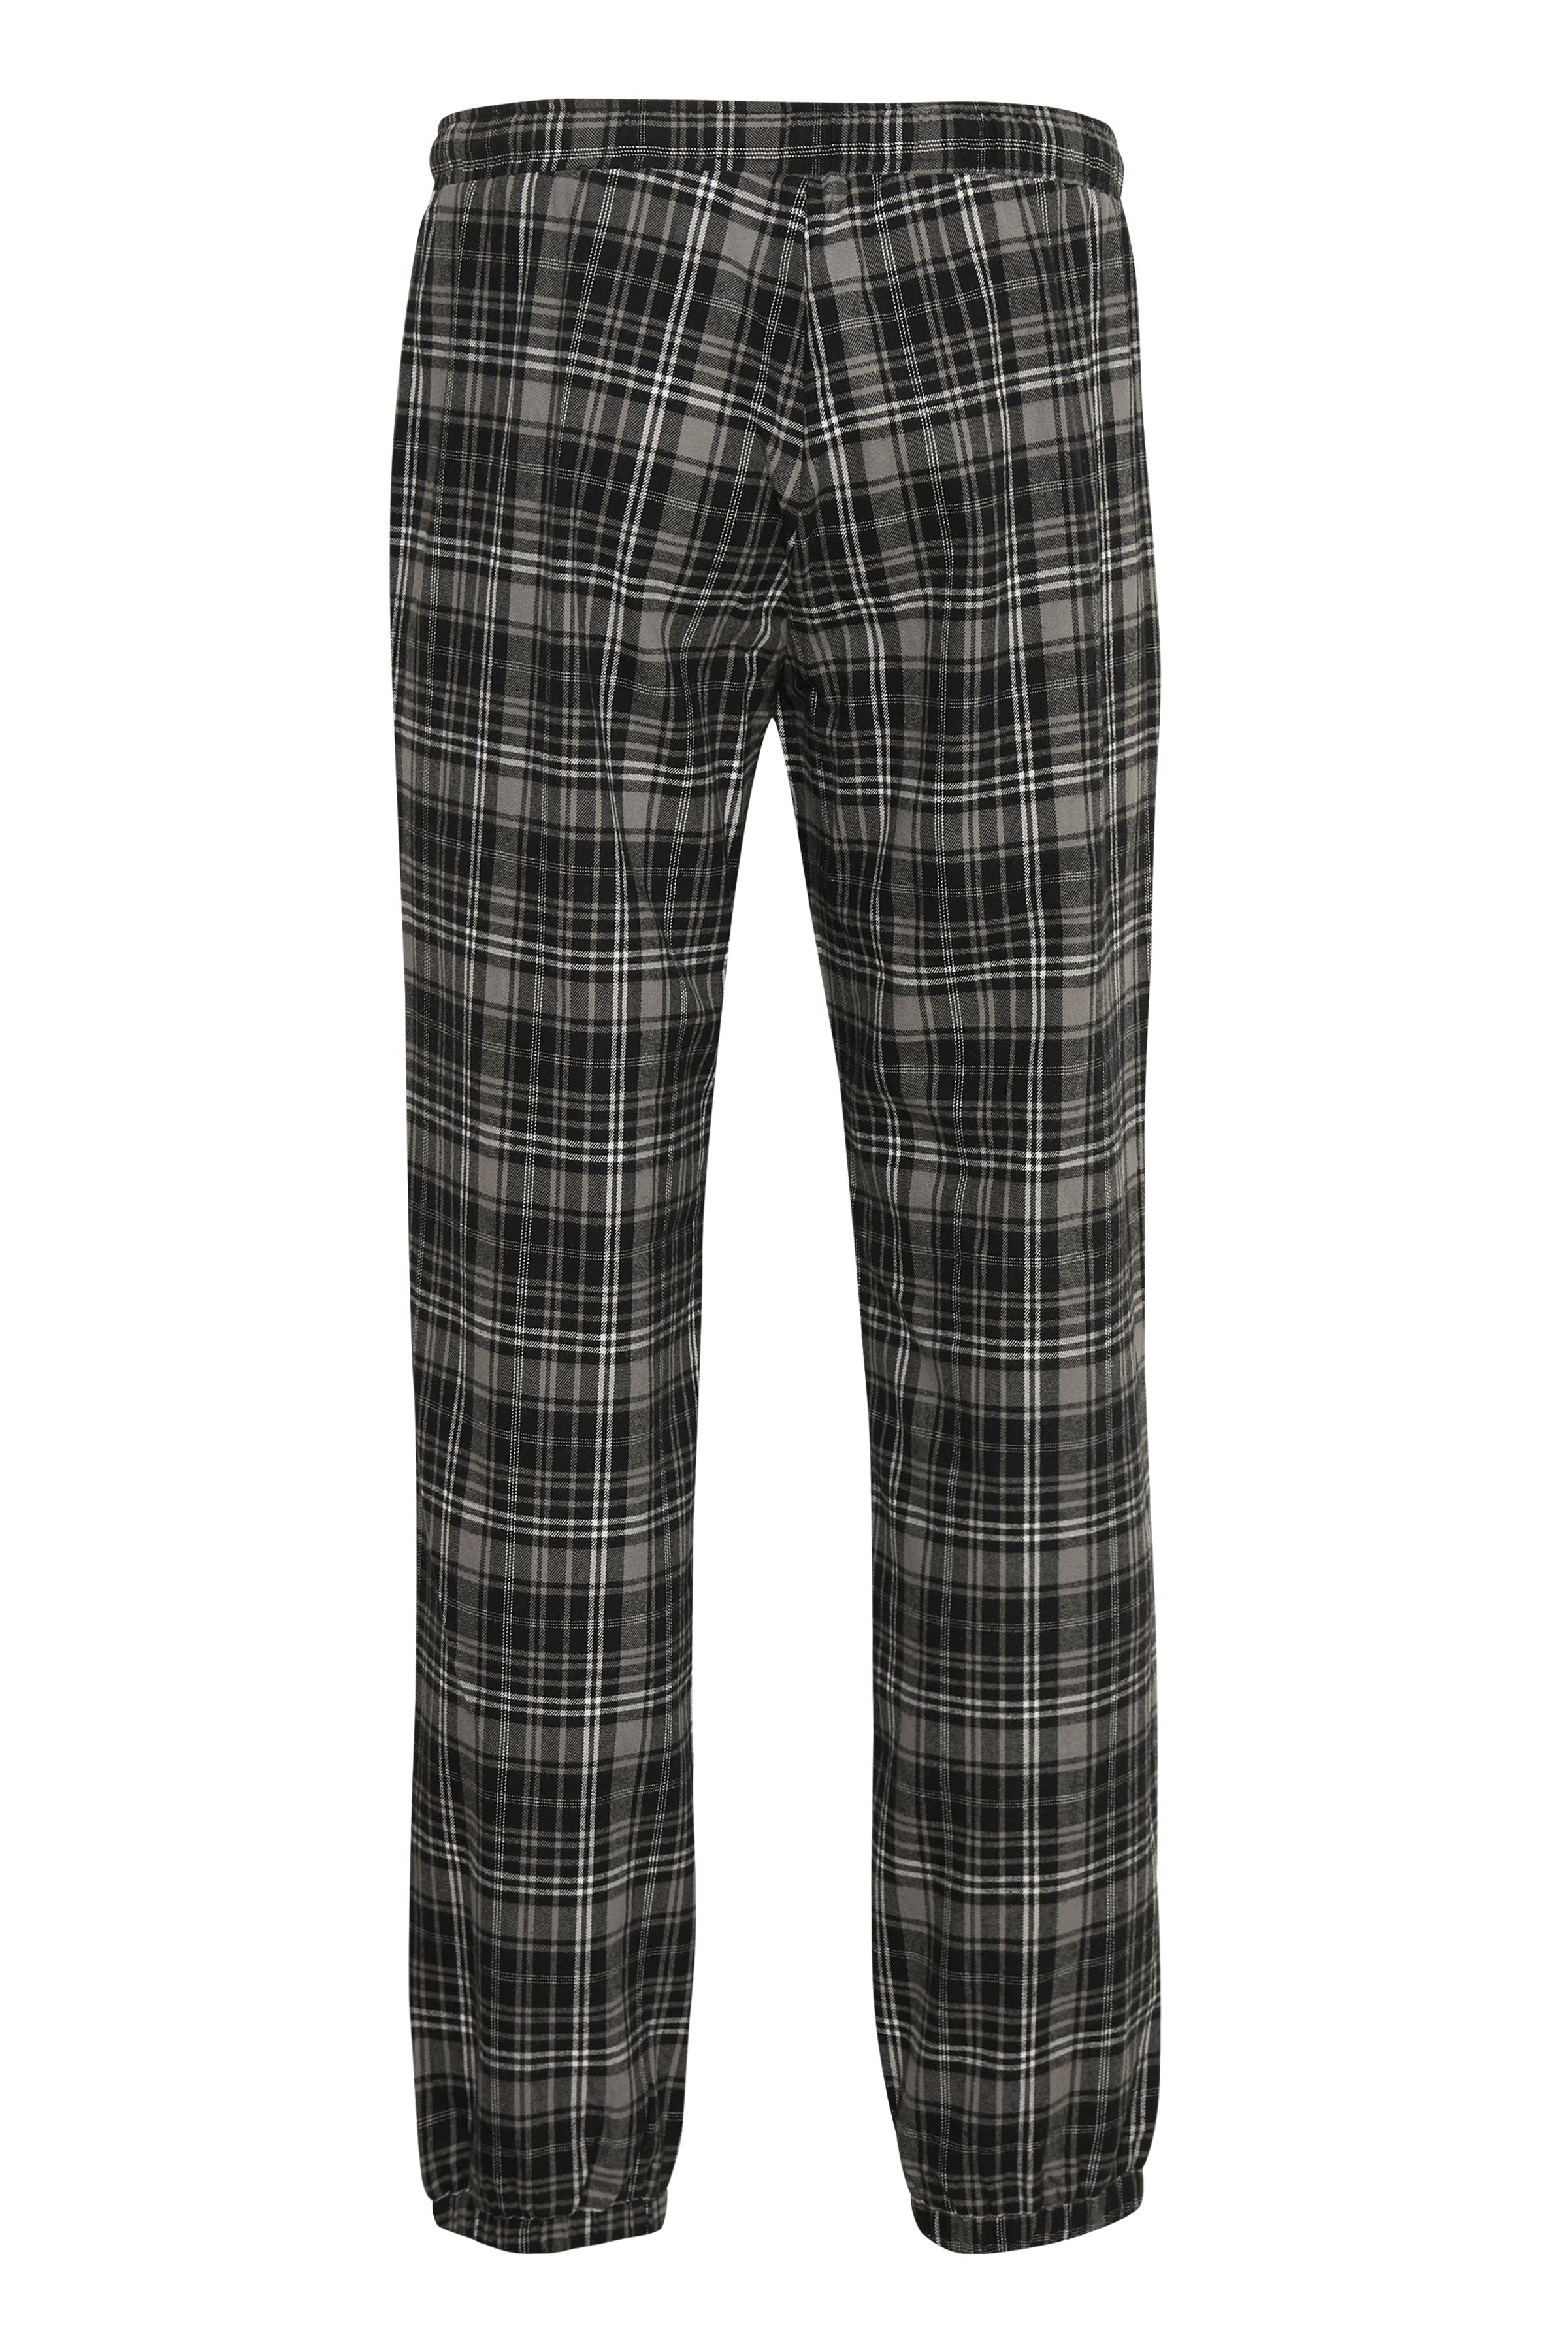 Black Gordy Pyjamasbukser – Køb Black Gordy Pyjamasbukser fra str. S-XXL her